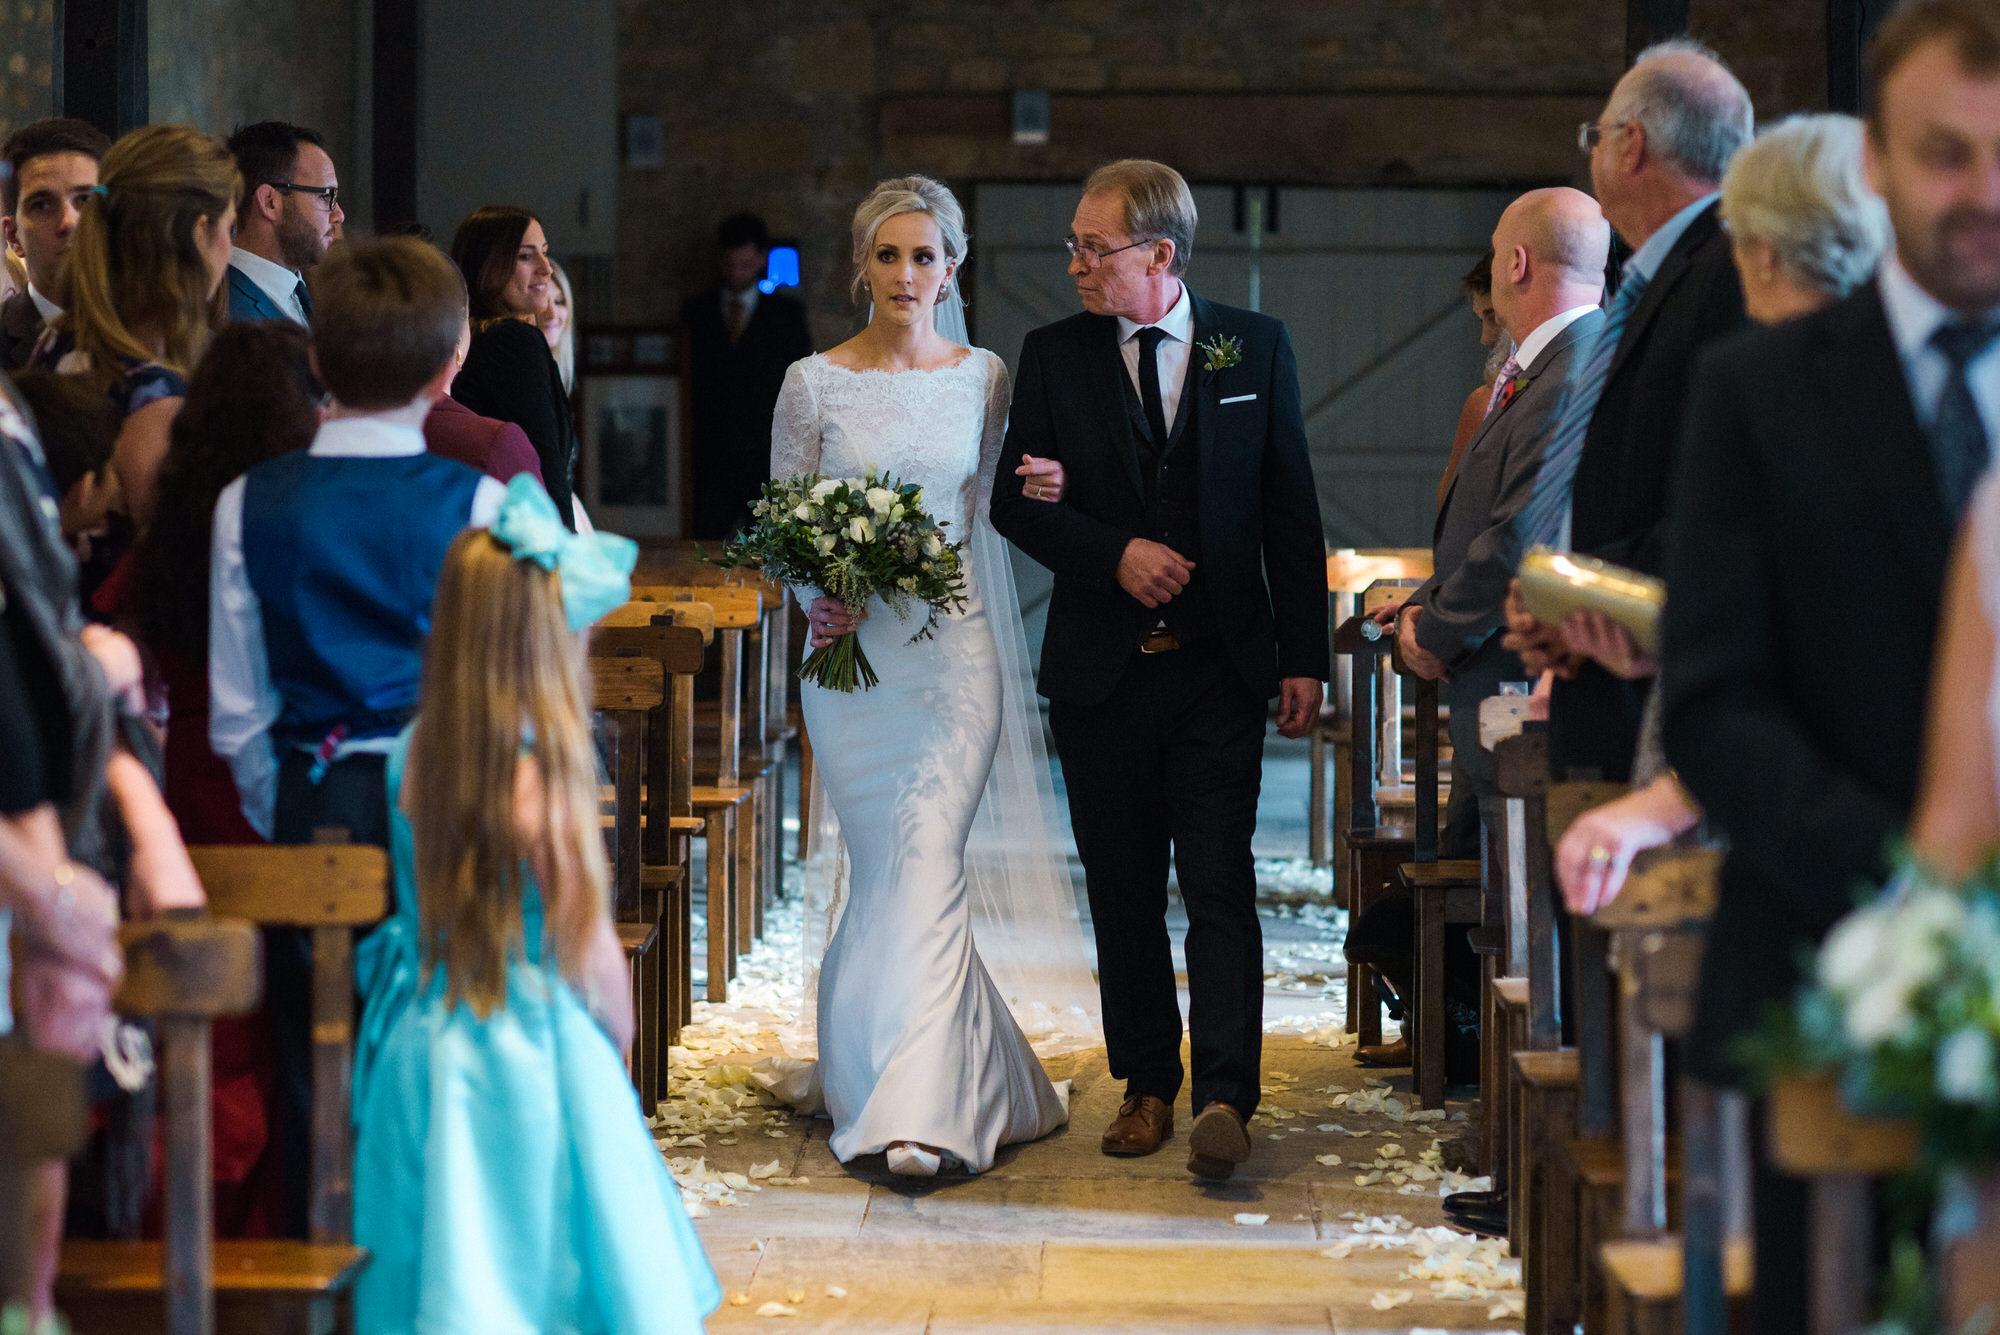 Brympton House wedding ceremony by simon biffen photography 19